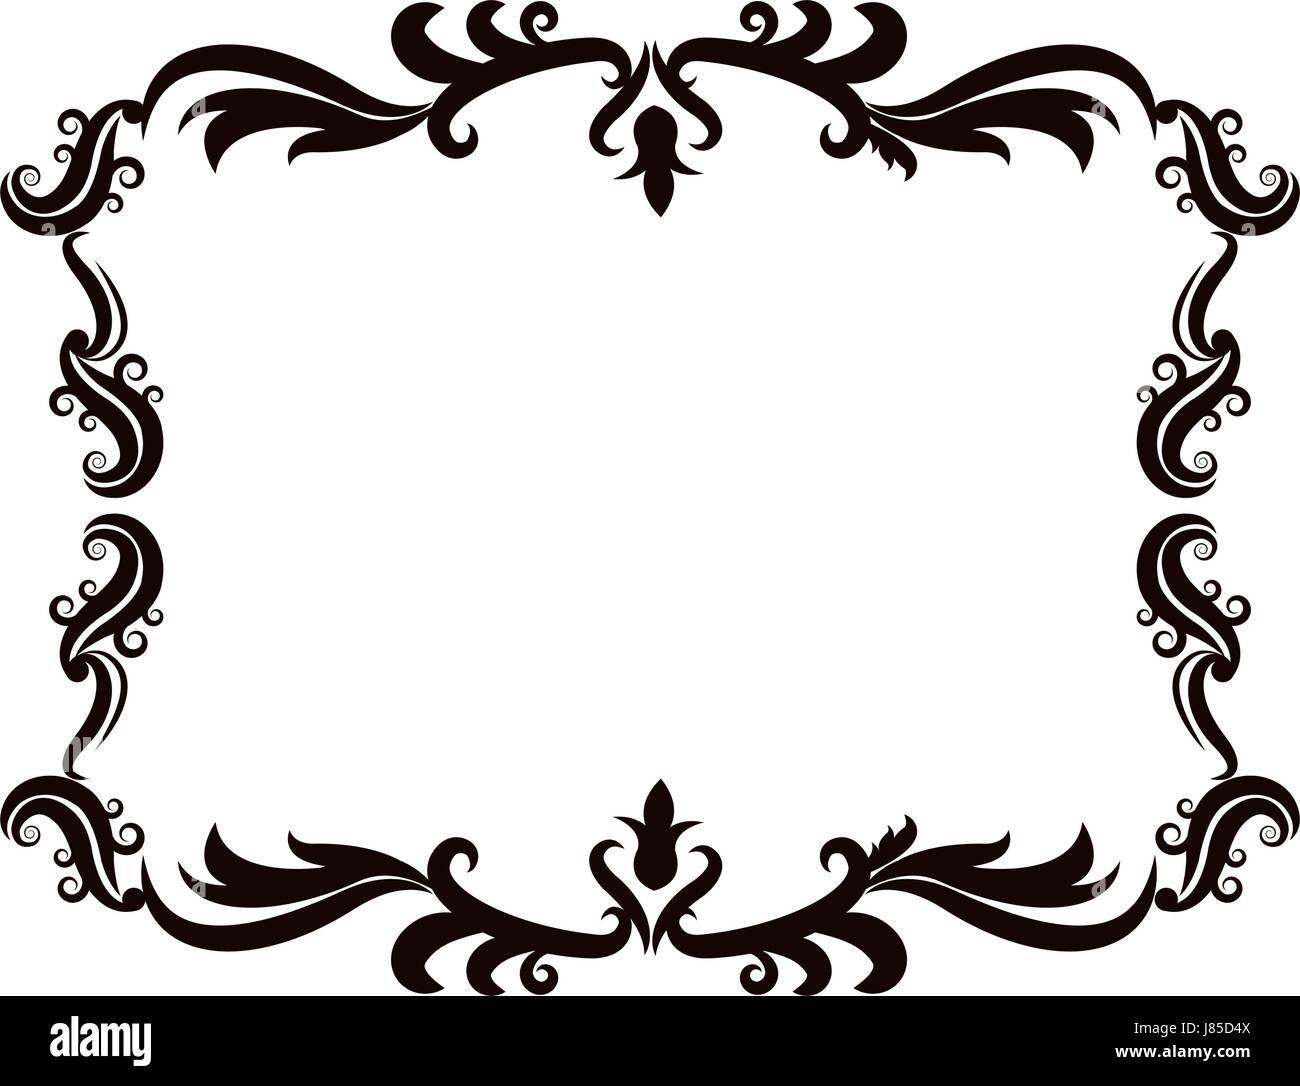 scroll border designs